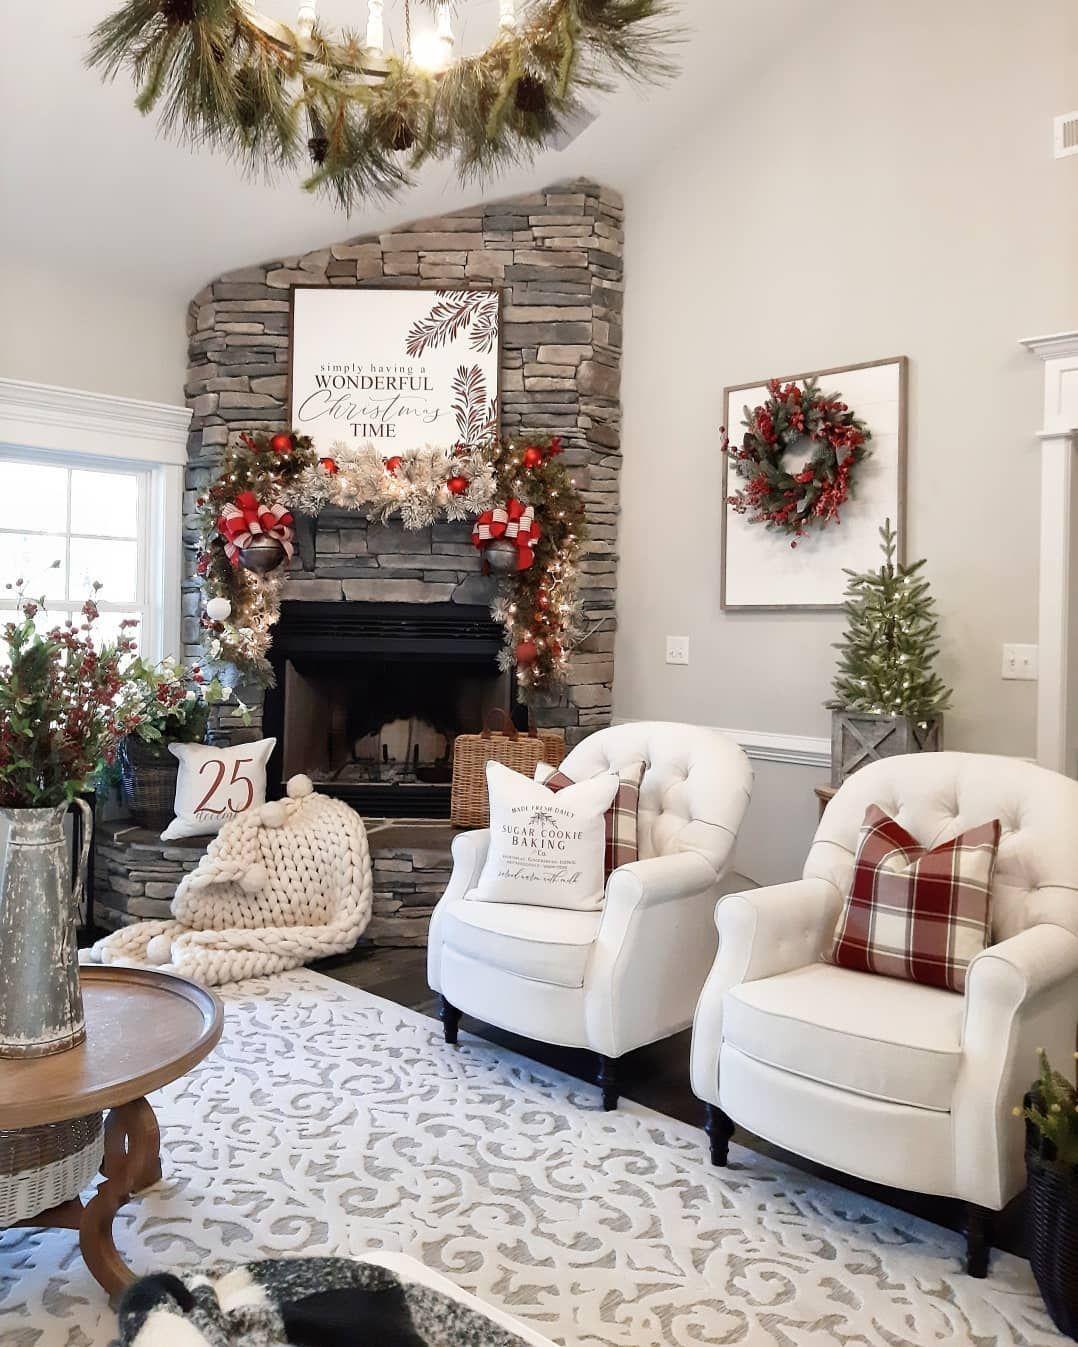 7 079 Likes 330 Comments Farmhouse Decor Influencer Bridgewaydesigns On In Winter Living Room Decor Farmhouse Christmas Decor Winter Living Room